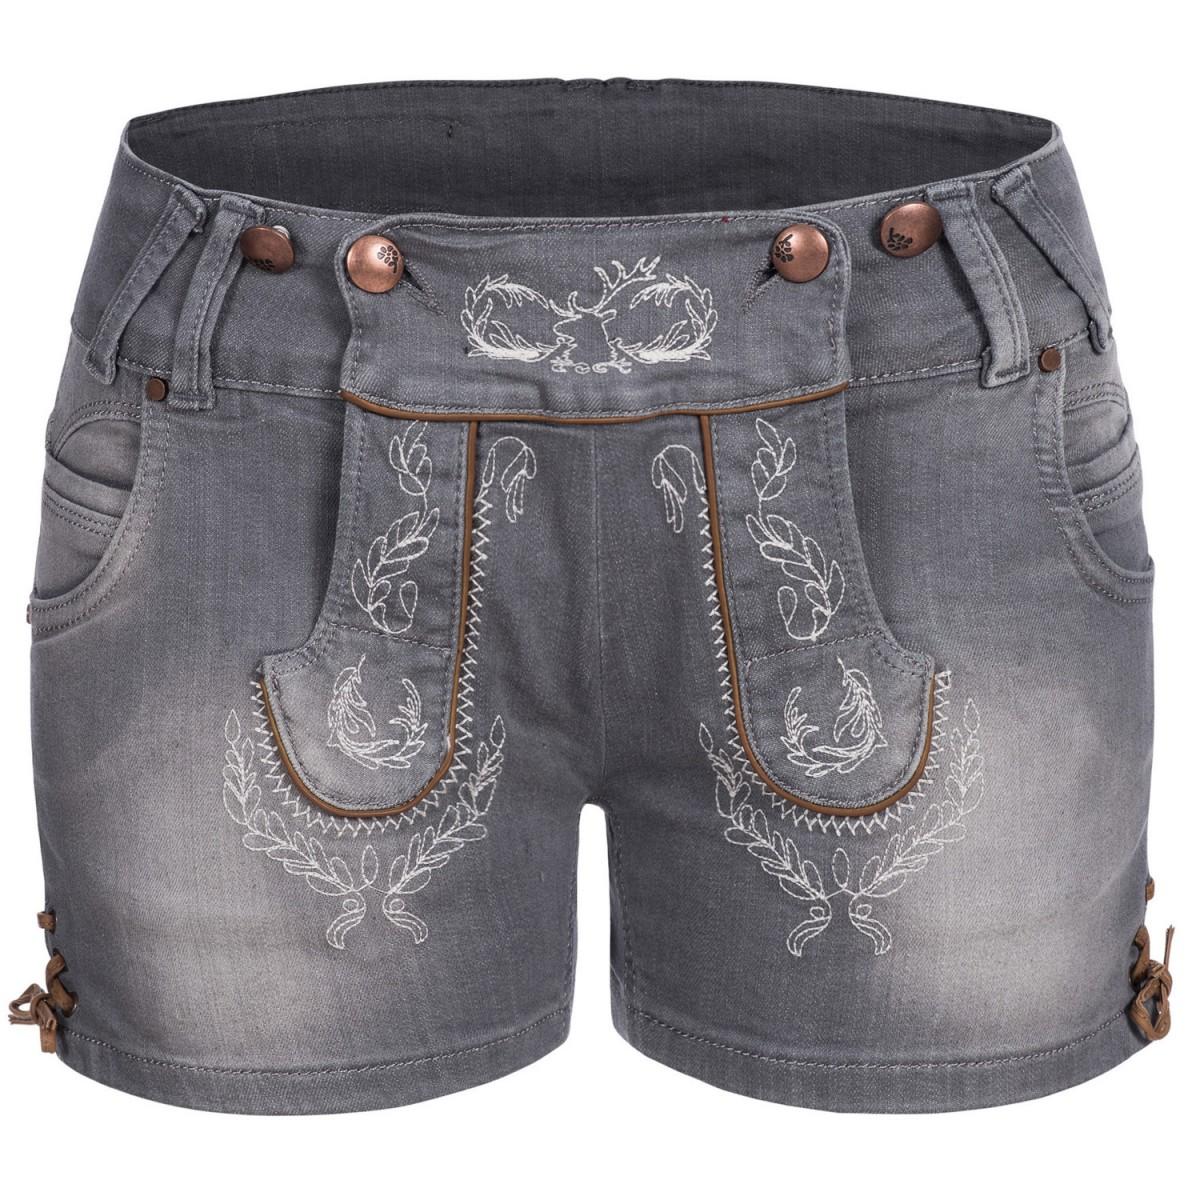 399a5ea82ebda Jeans-Lederhose in Grau von Hangowear